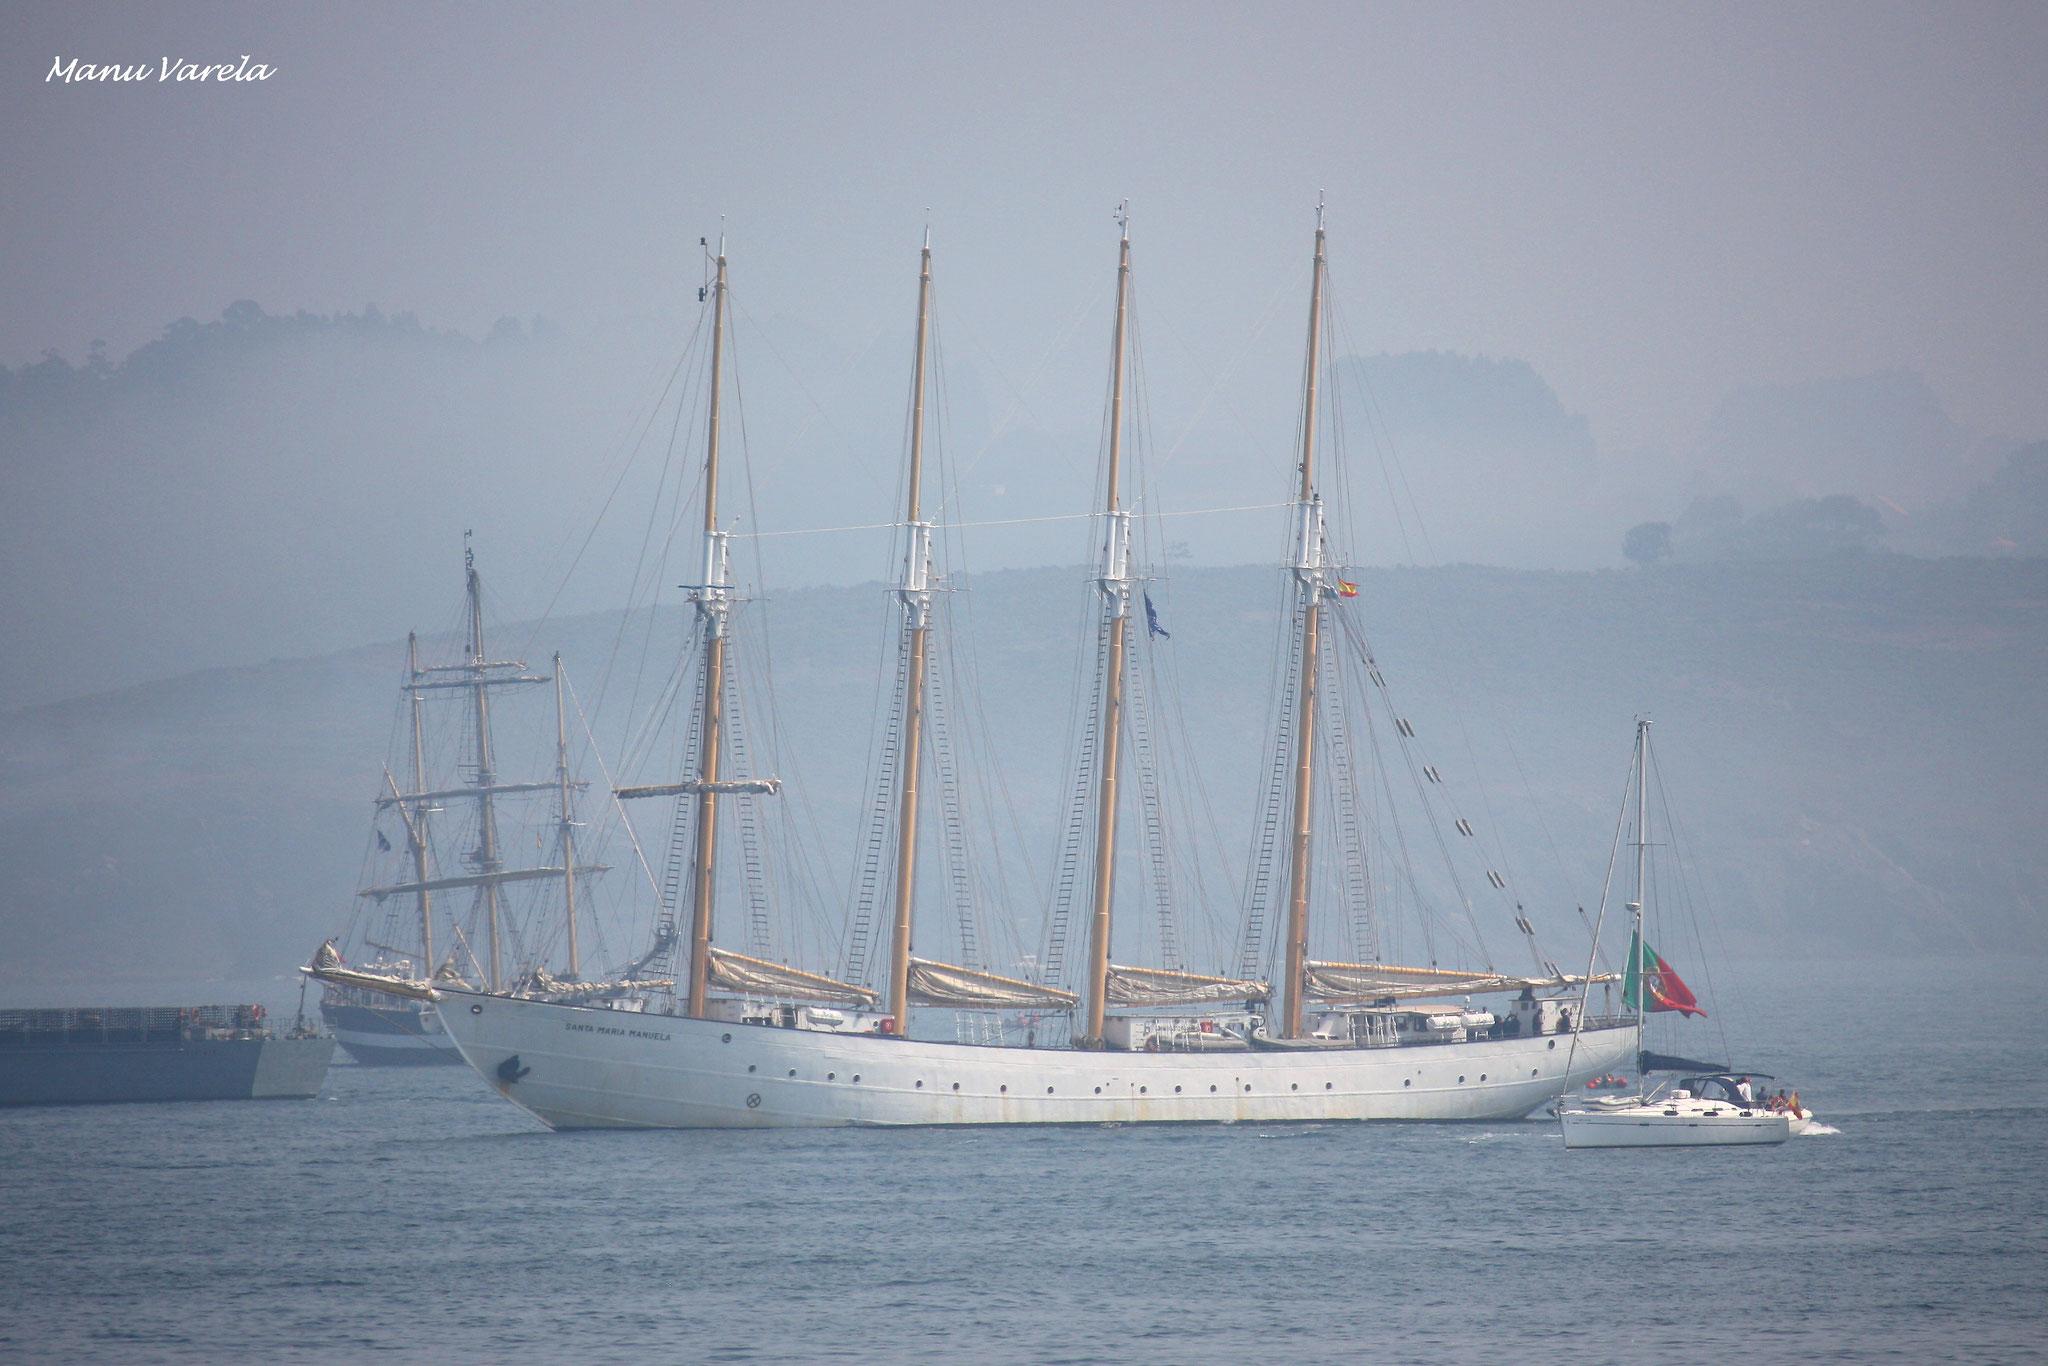 Desfile naval de salida - Tall Ships Races La Coruña - Agosto 2016